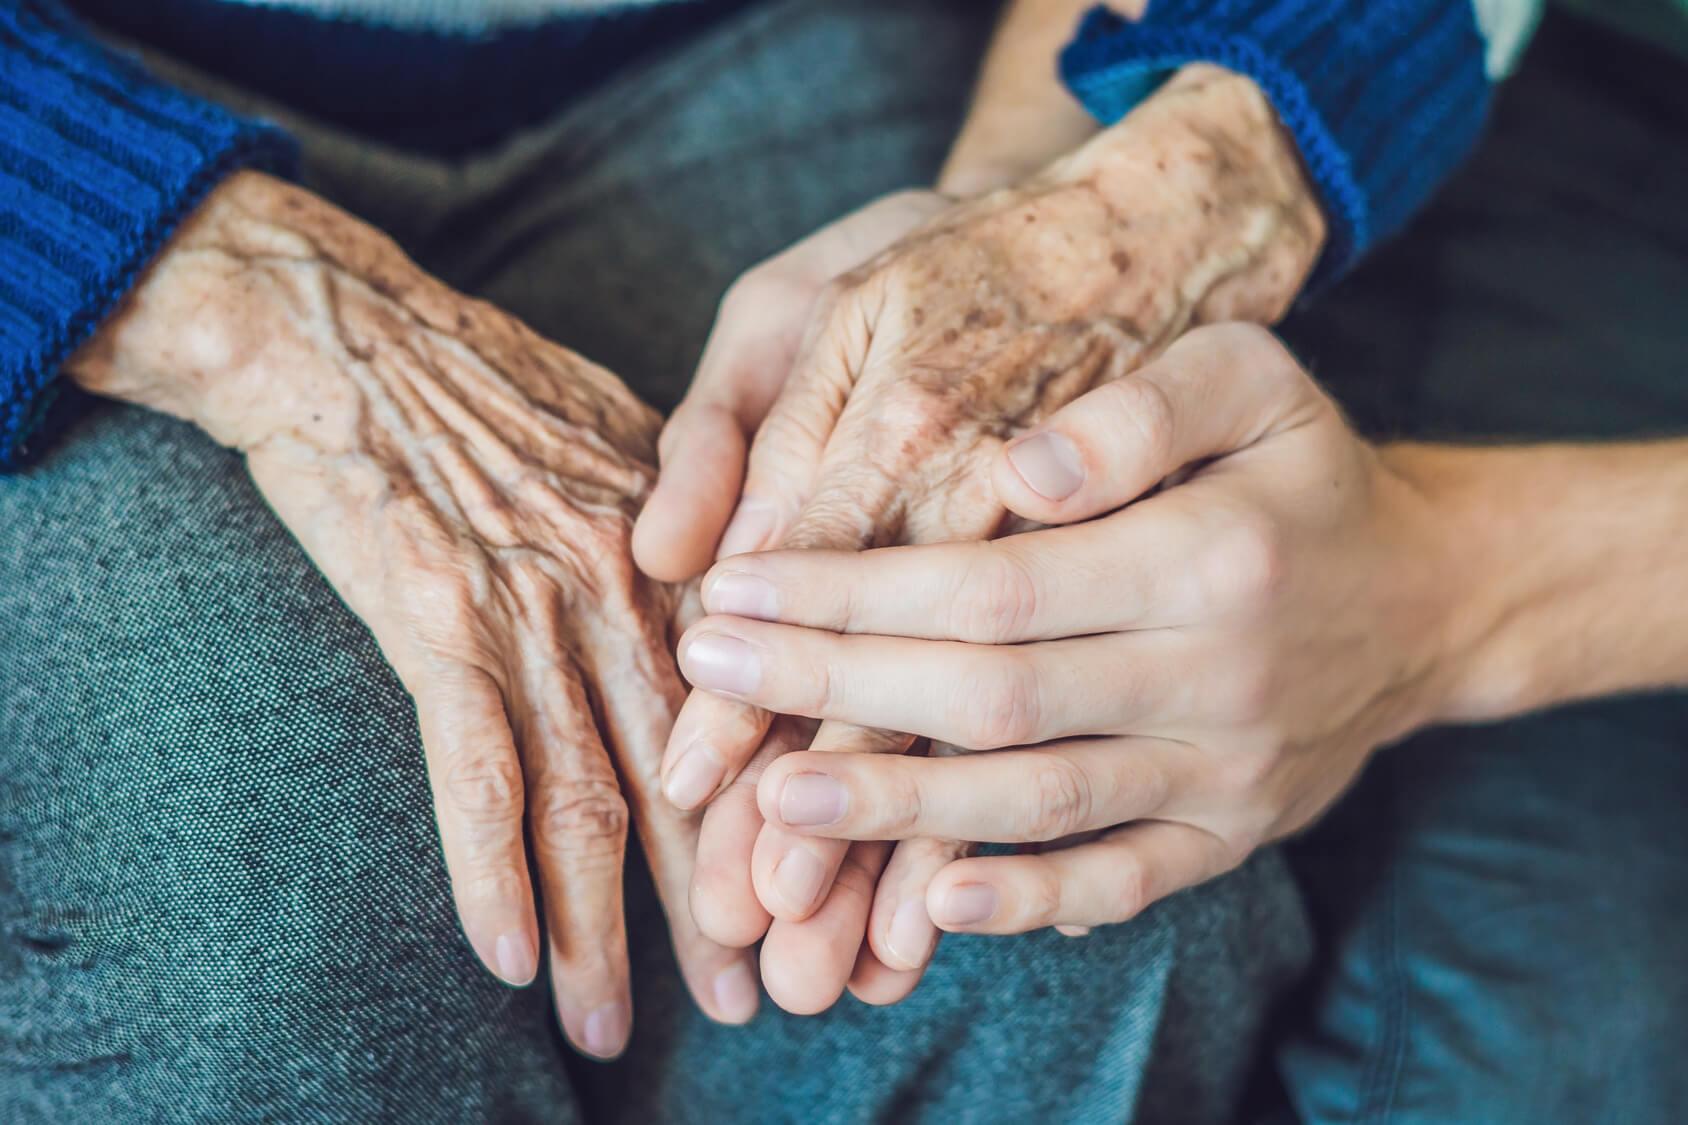 estate-planning-conversations-with-elderly-parents